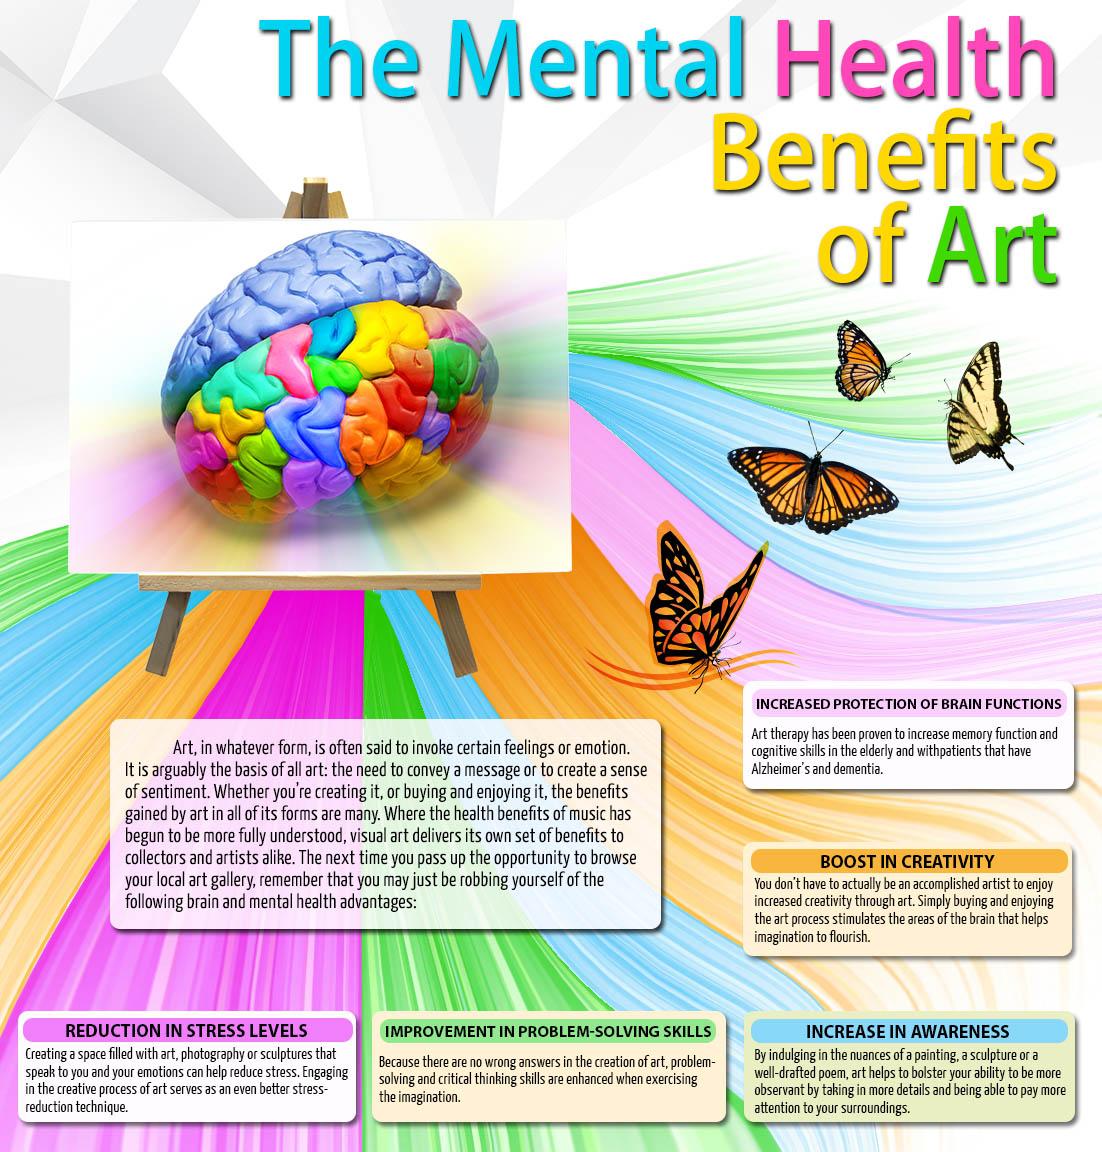 Art Gallery Laguna Beach: The Mental Health Benefits of Art